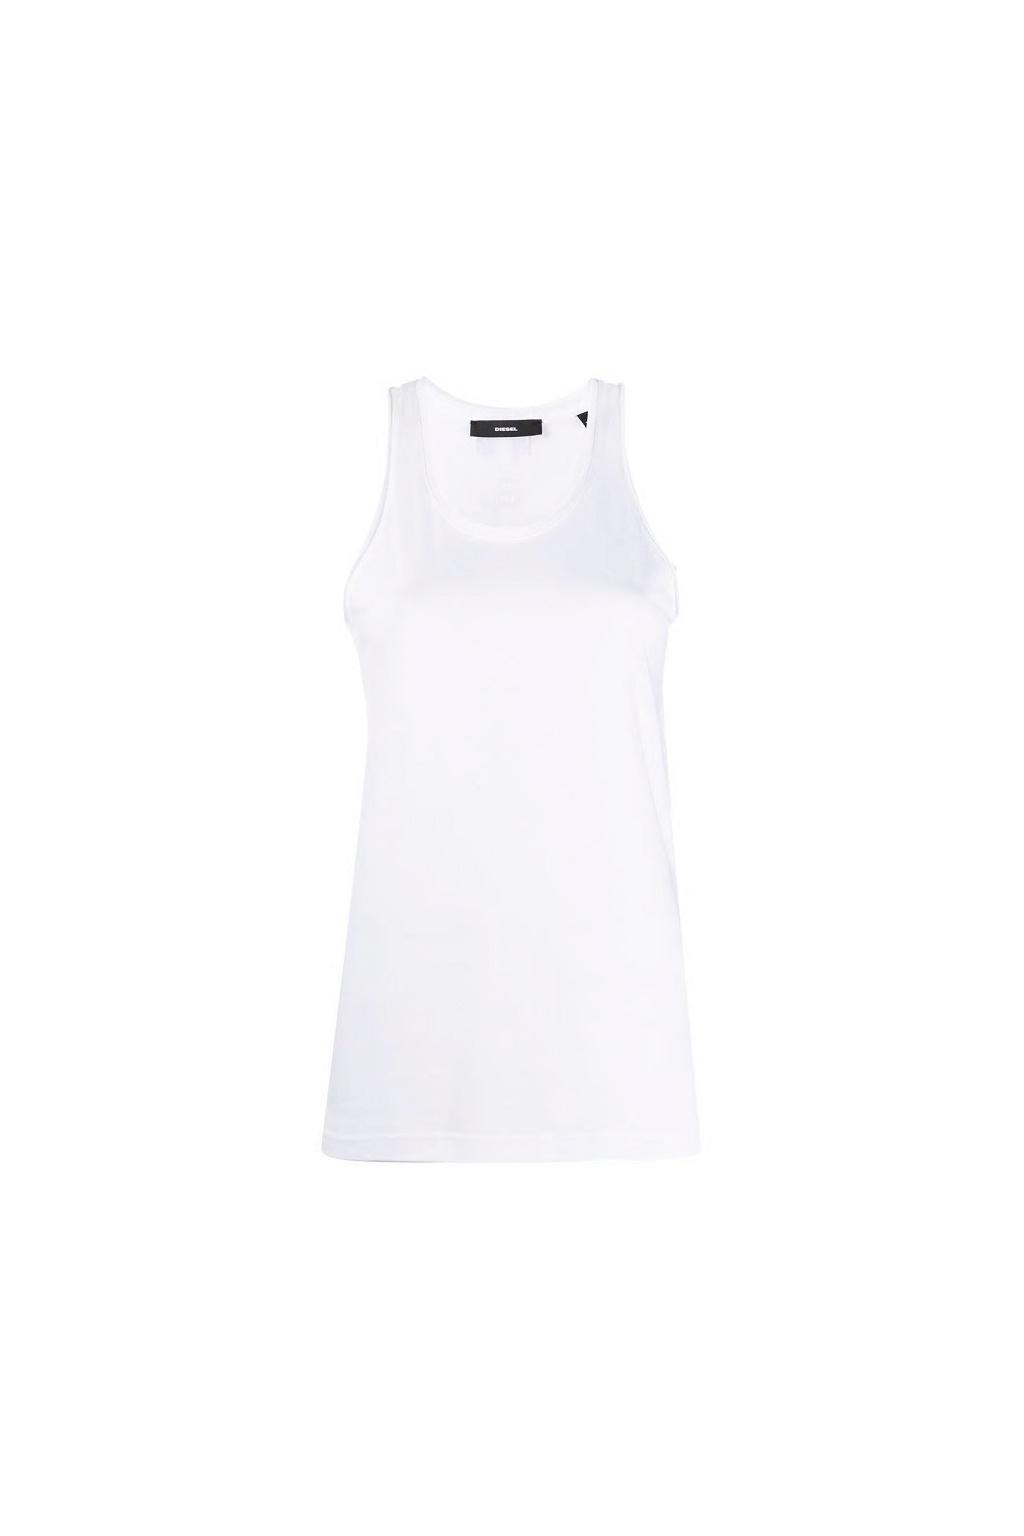 00SELJ 0DAWM Dámské tričko Diesel T Kelly B bílé